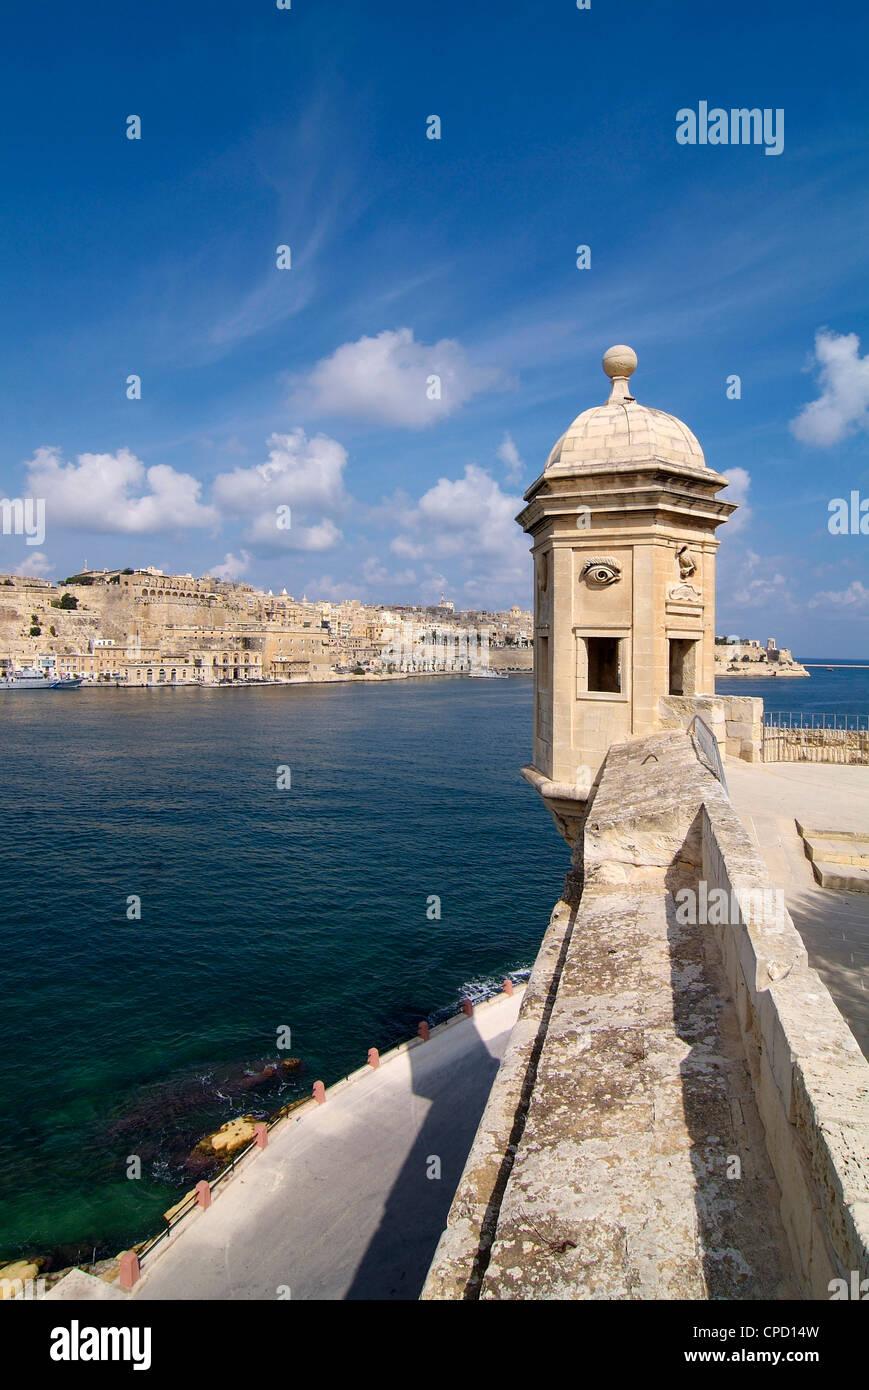 Fort St. Michael, Senglea, Grand Harbour, Valletta, Malta, Mediterranean, Europe - Stock Image